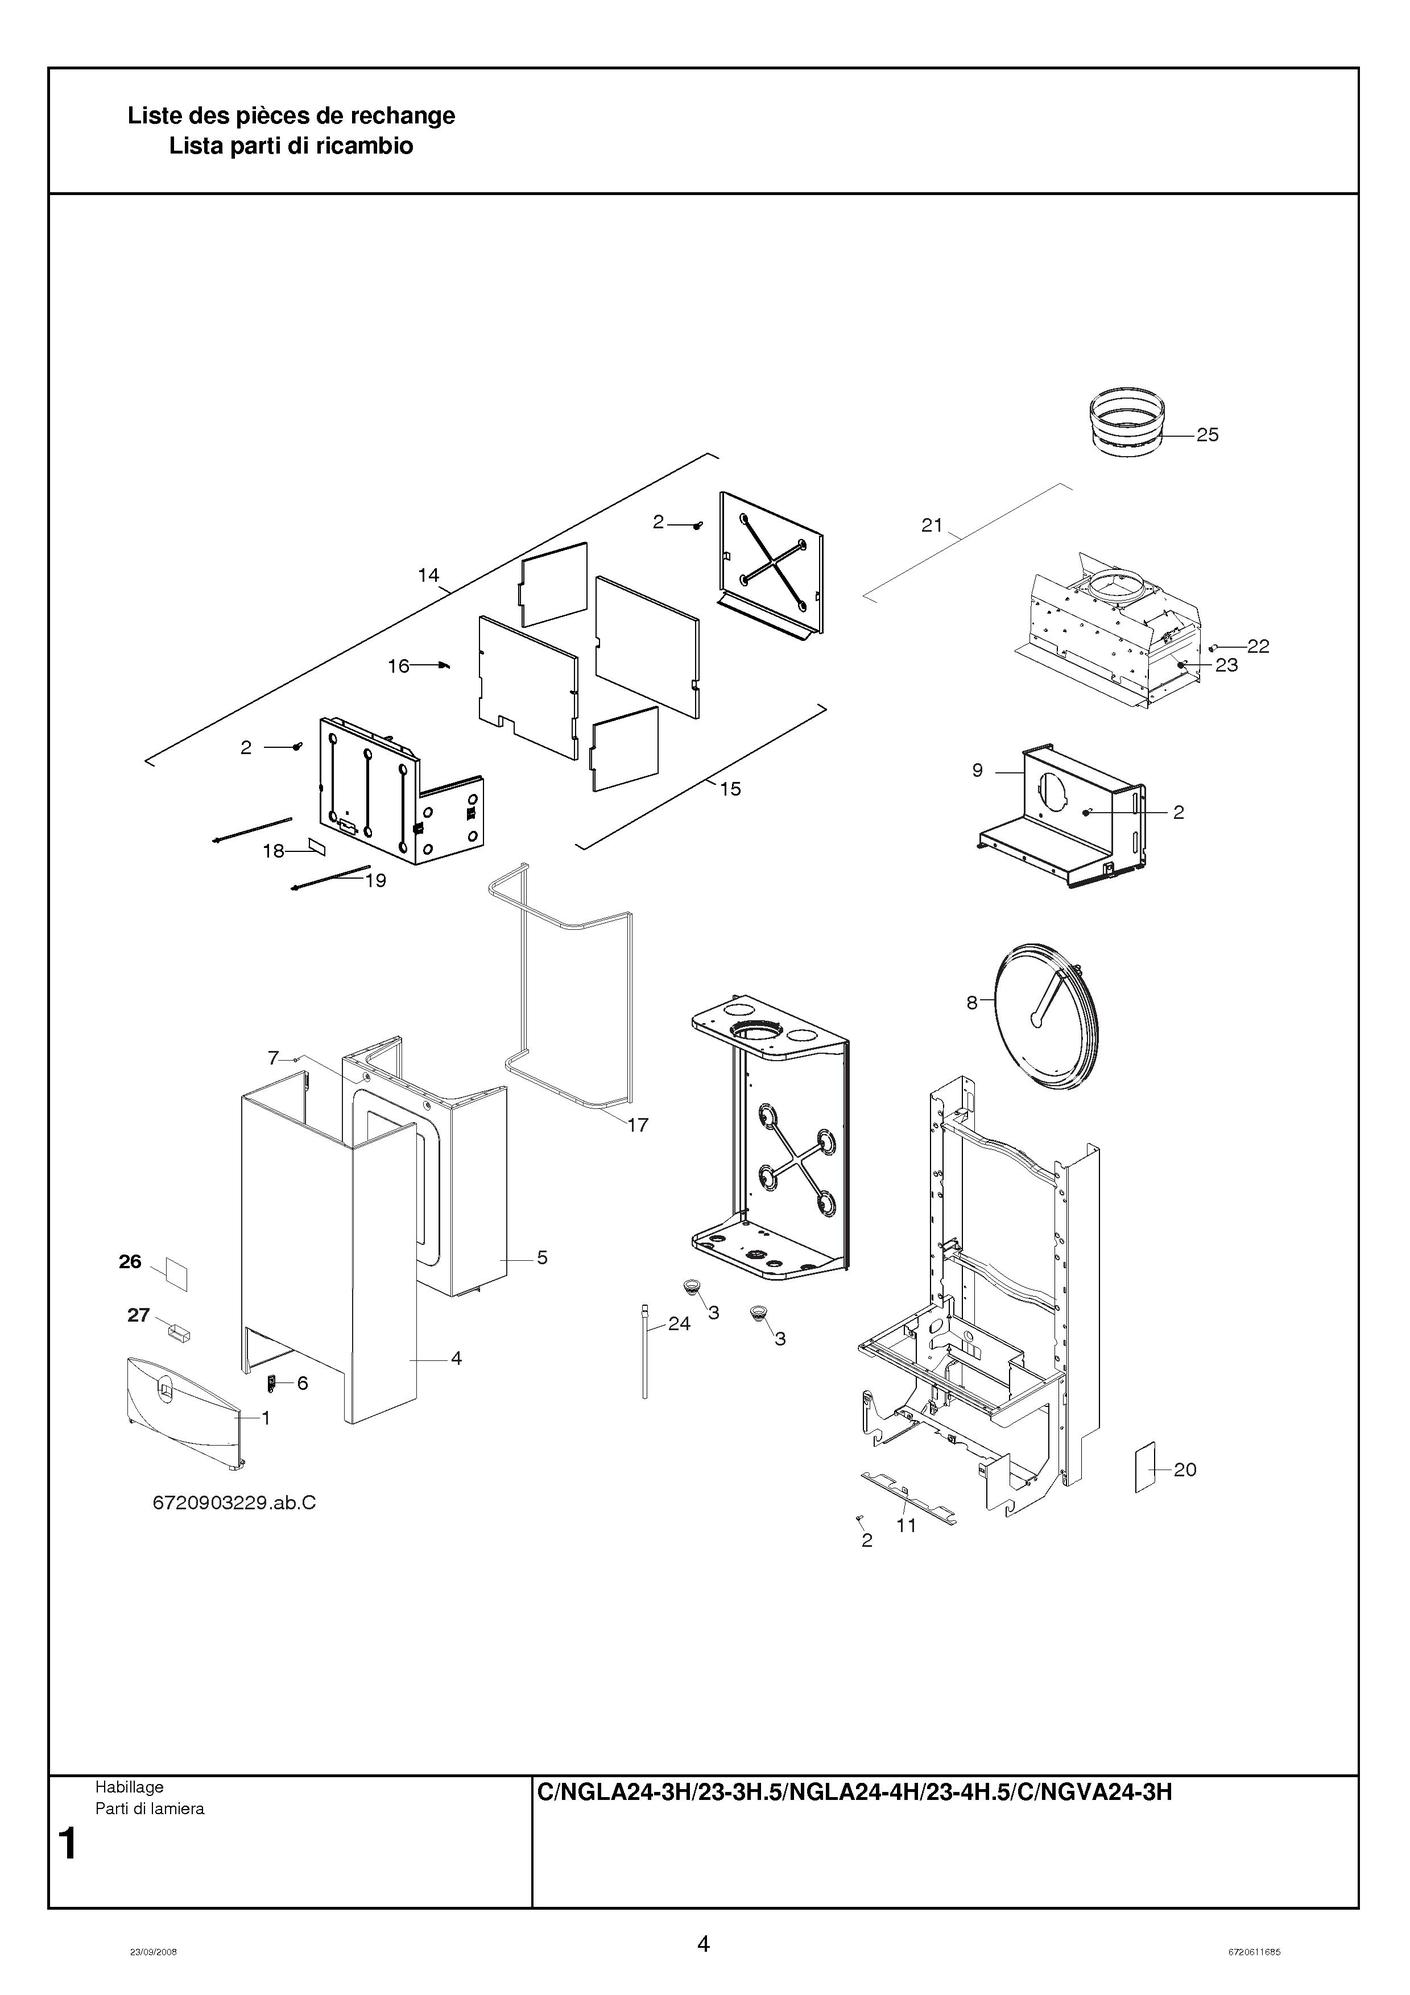 megalis 400 elm leblanc notice. Black Bedroom Furniture Sets. Home Design Ideas